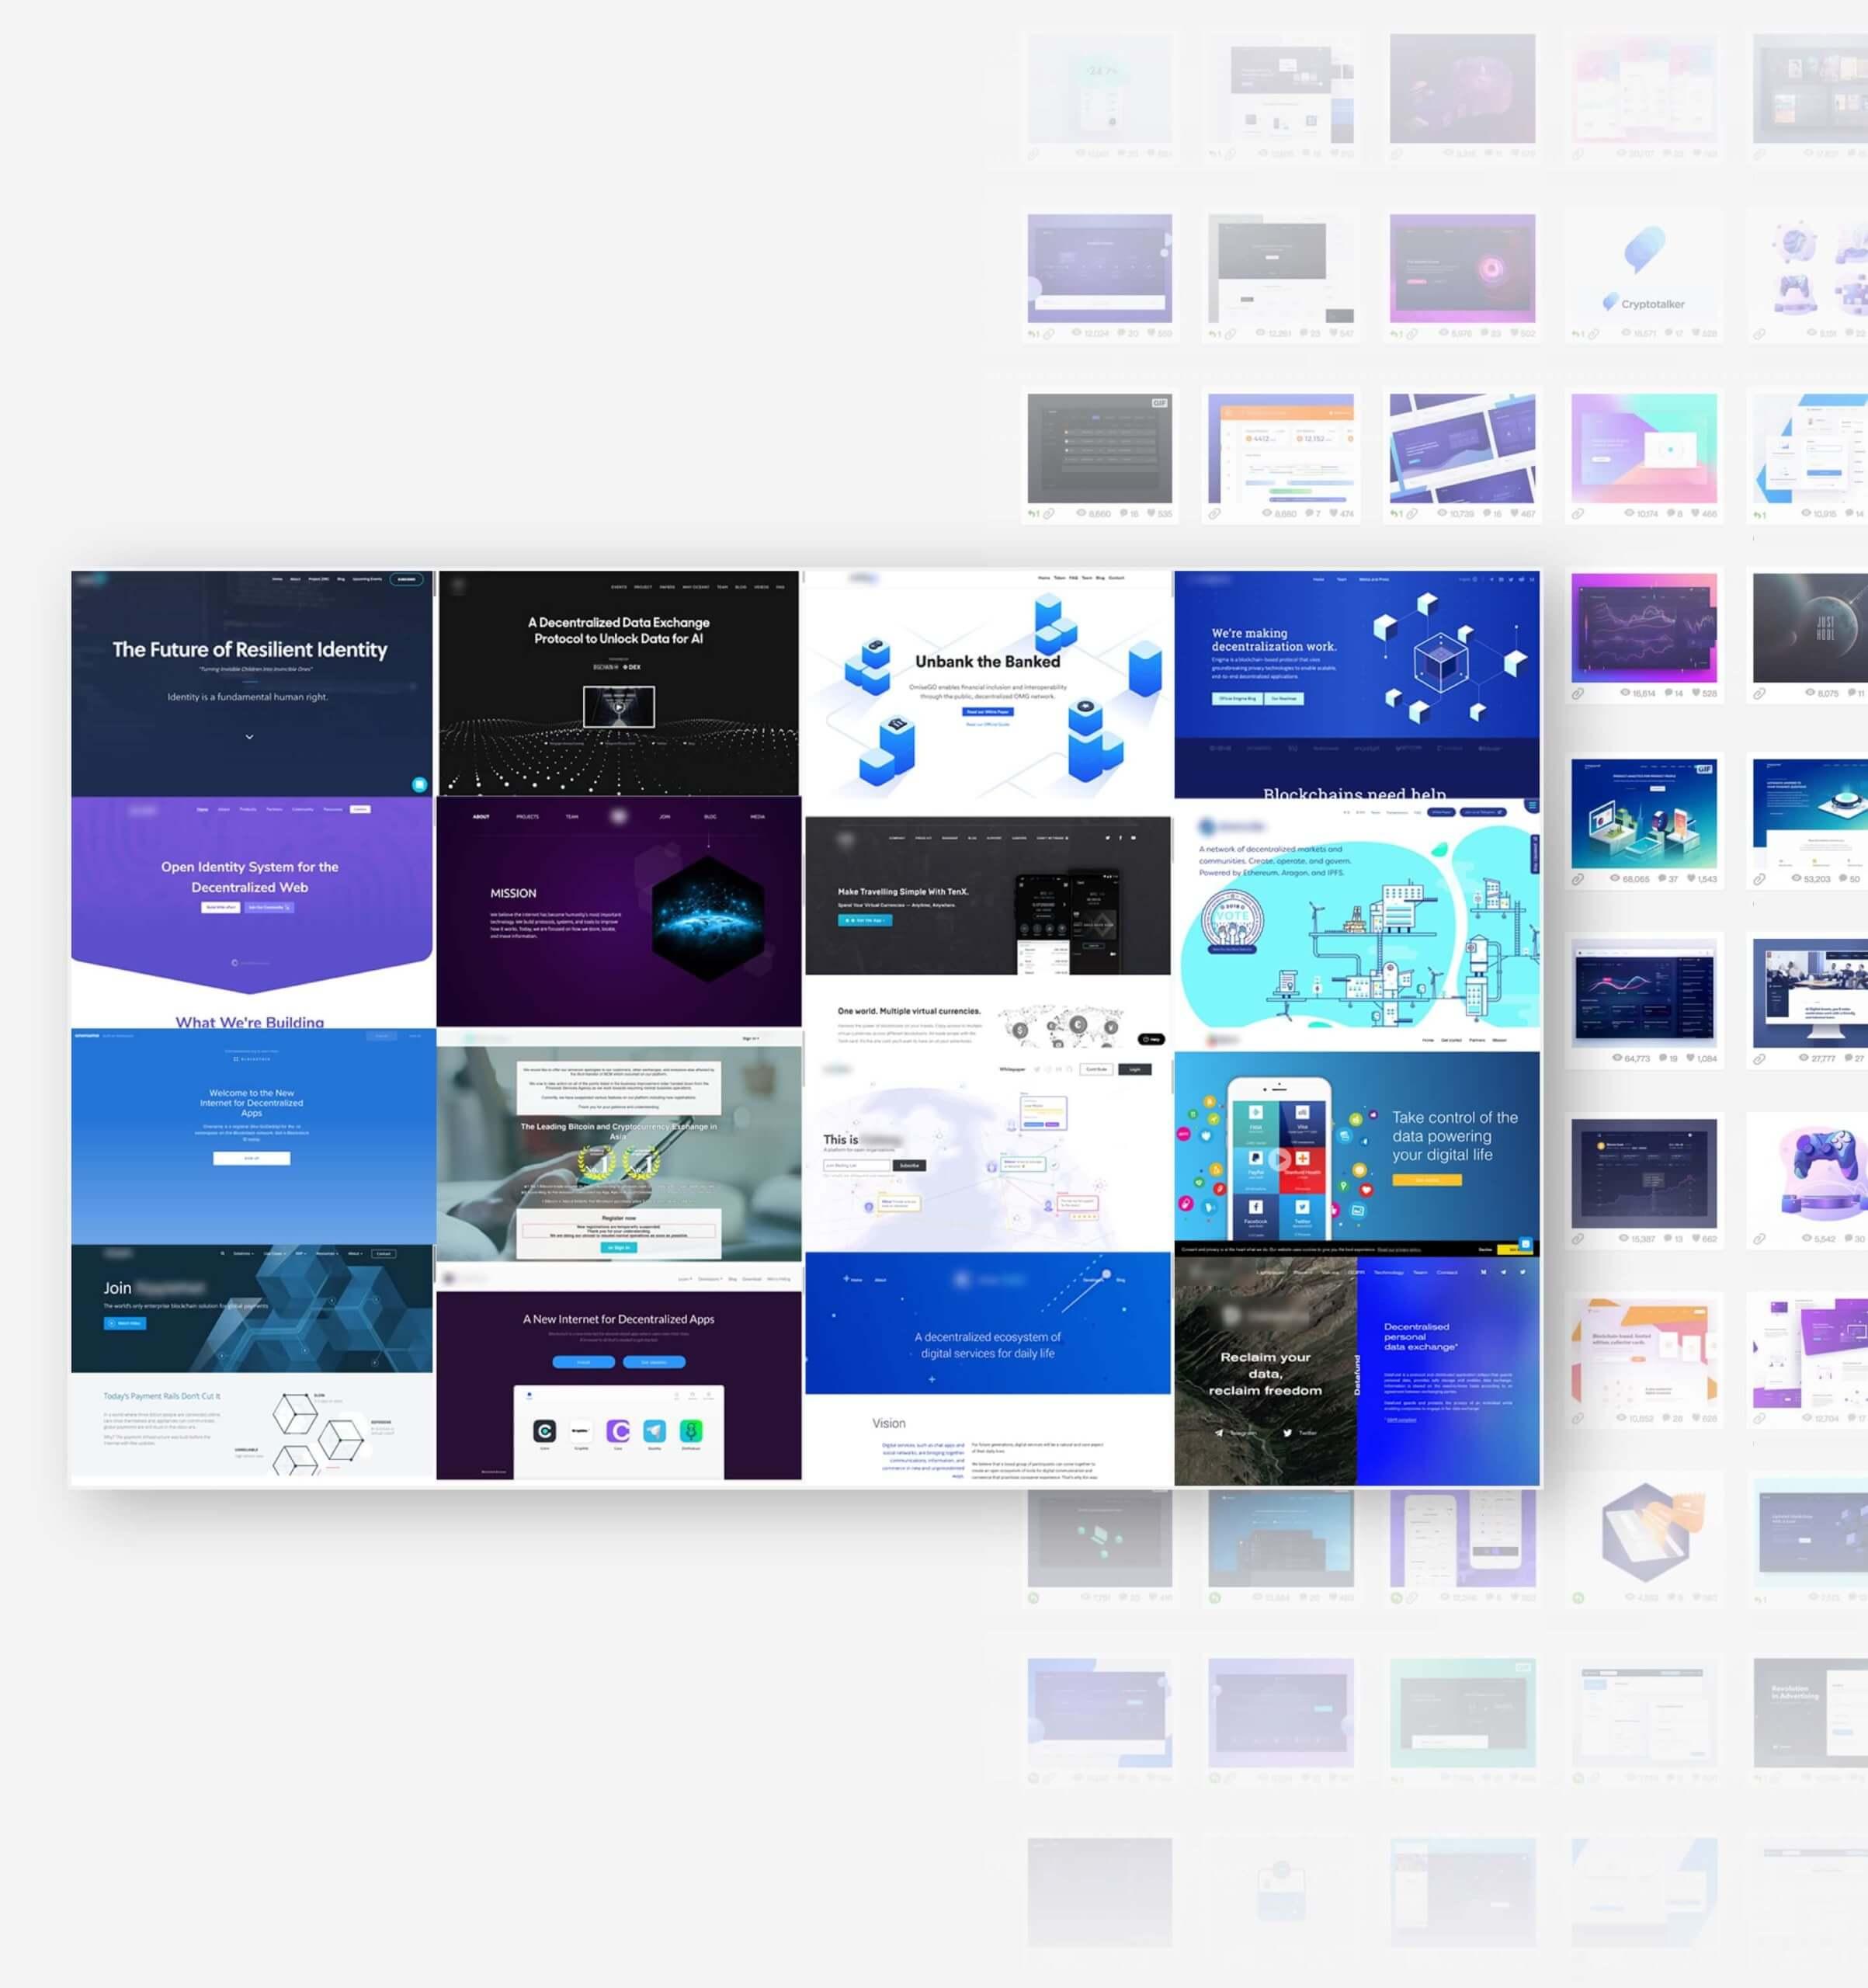 Jolocom_rebranding-Nezhynska-blockchain-research